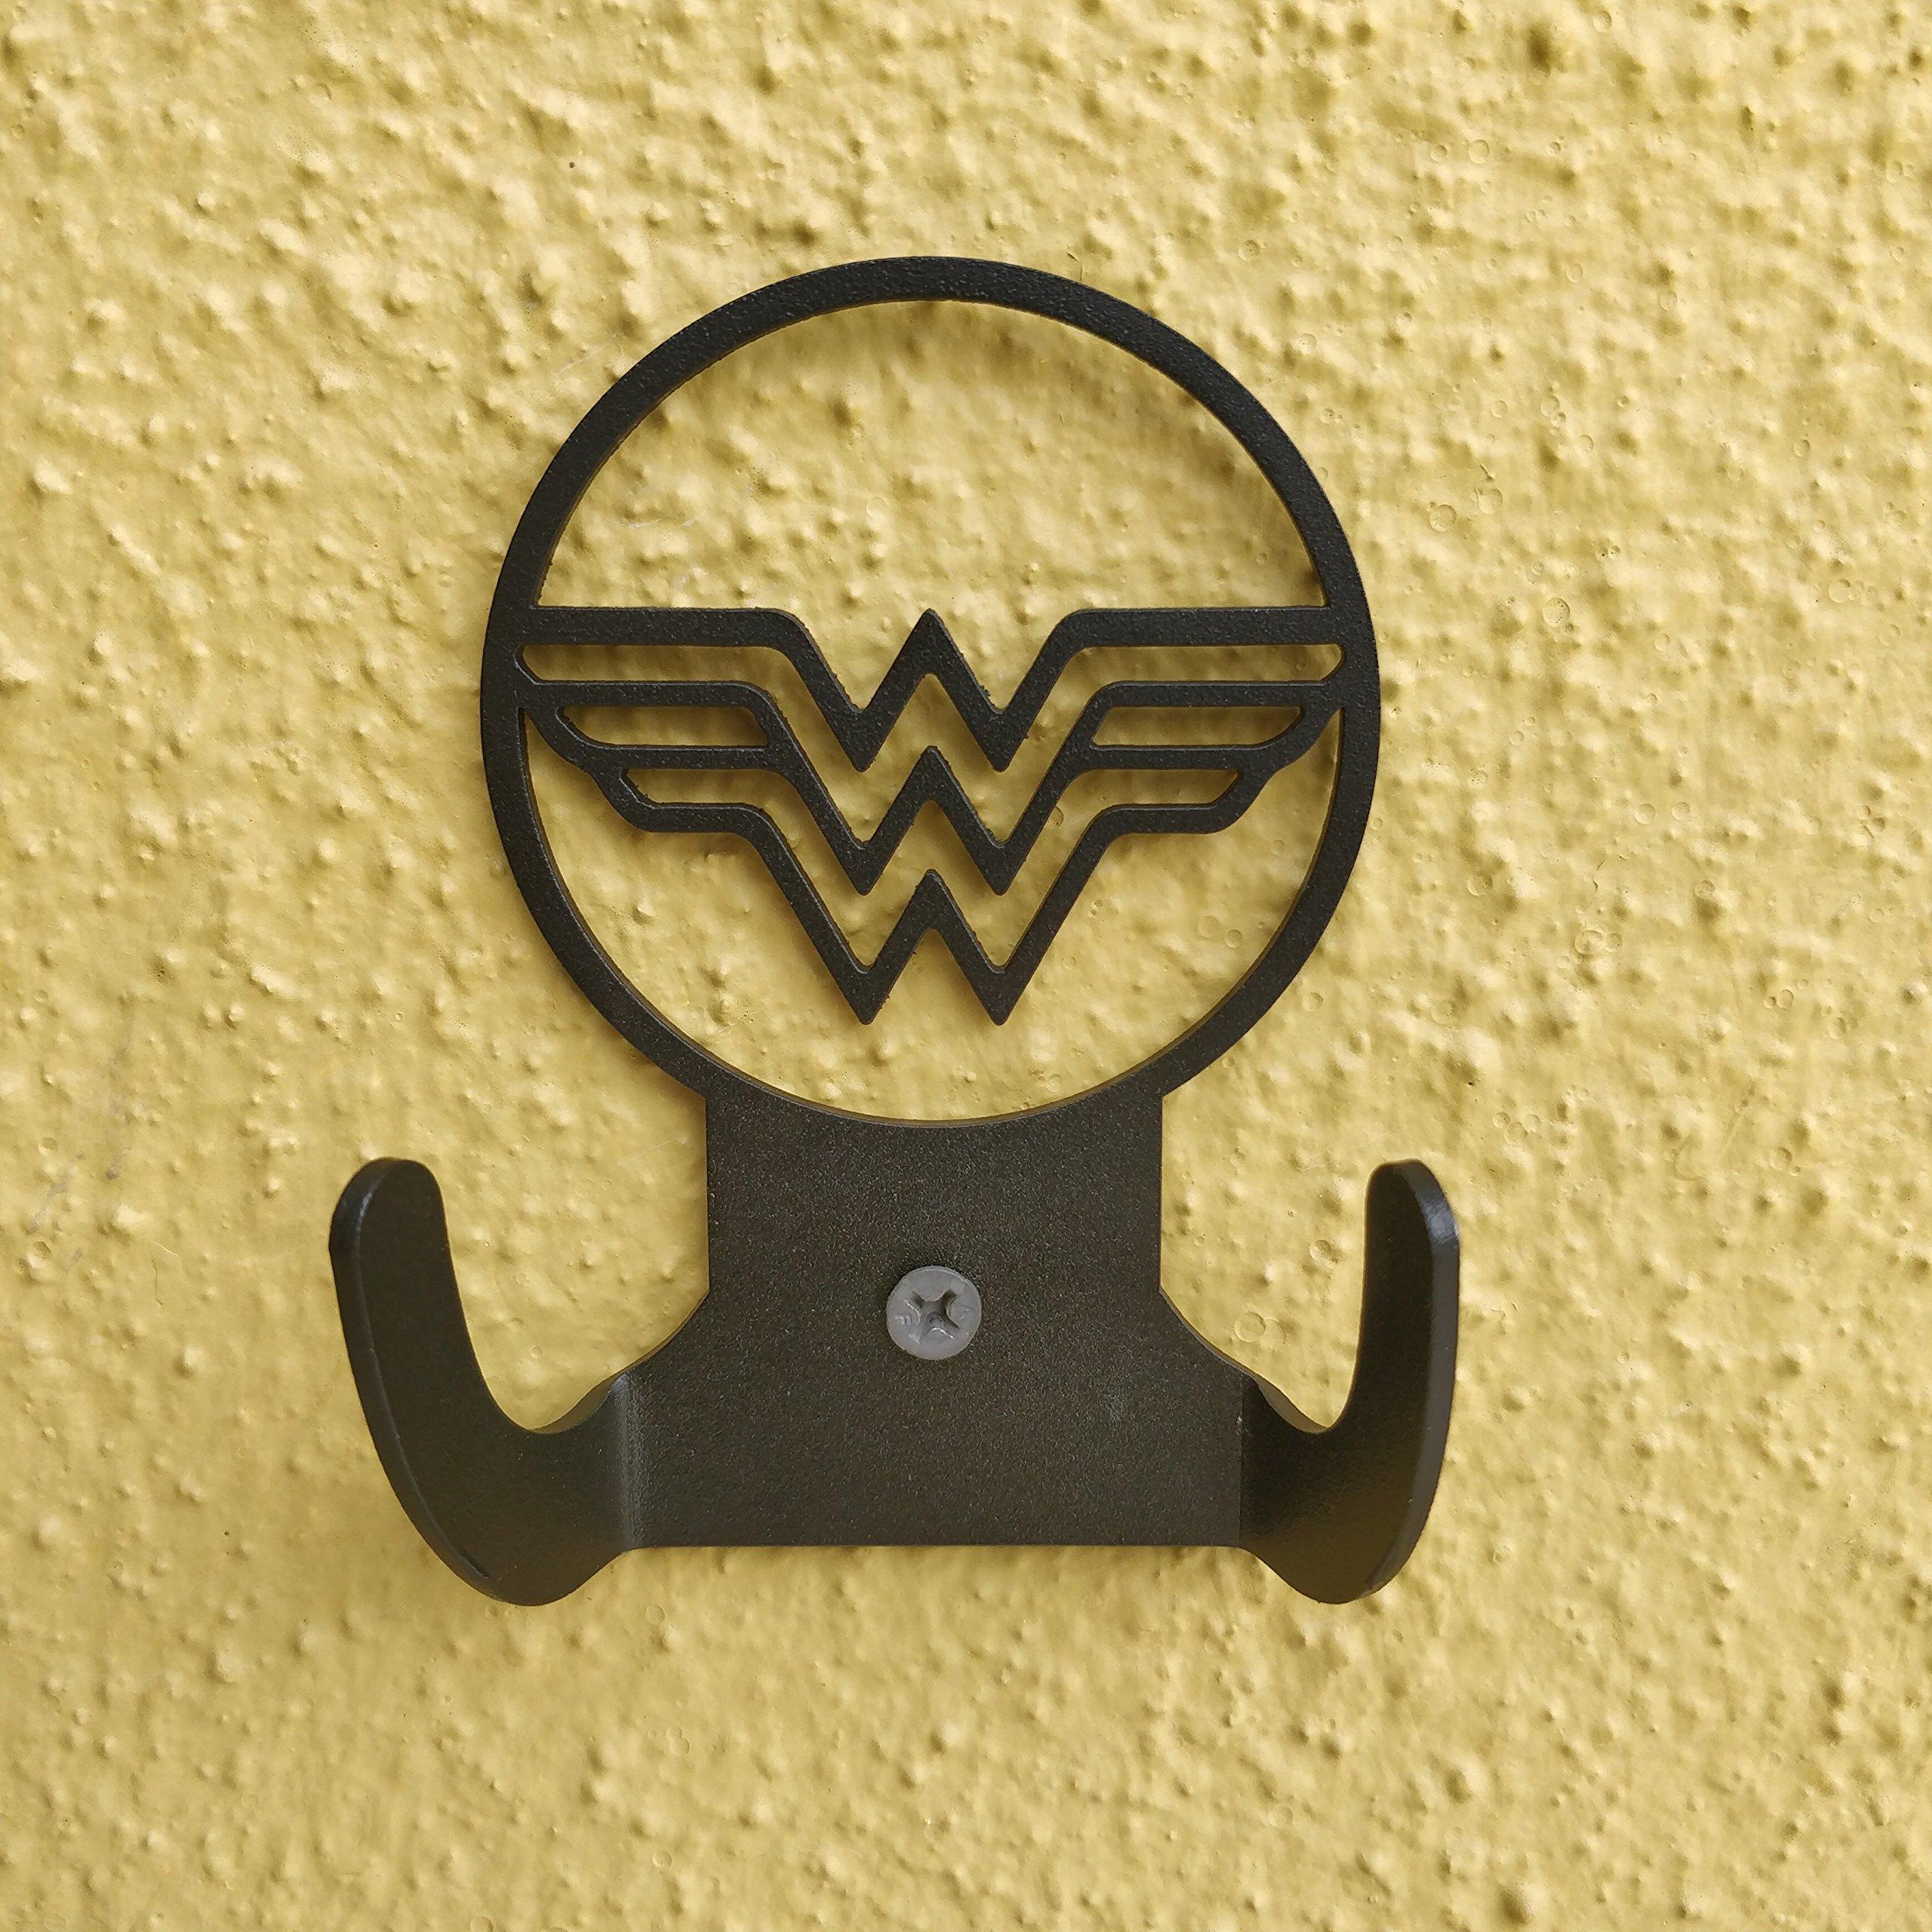 HeavenlyKraft Wonder Woman Logo Steel Wall Hook Dual Holder for Living Room Coat Hat Robe Hanger Bathroom Towel Kitchen Strong Heavy Duty Garage Storage Organizer Utensil Hook Single